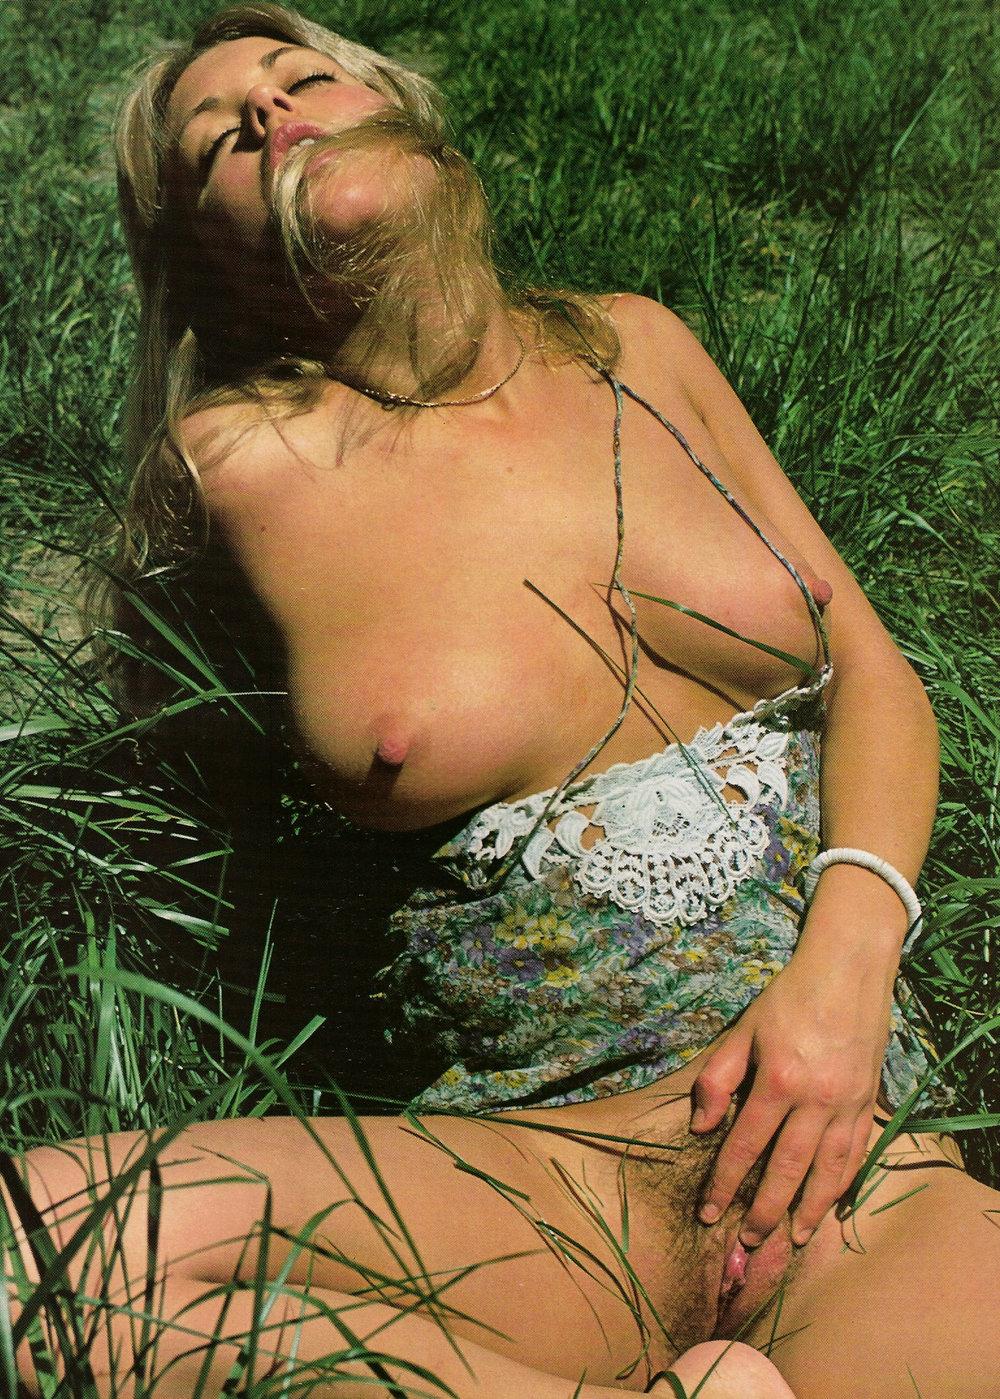 03 Dawn Shaw Hustler Magazine 1976.jpg